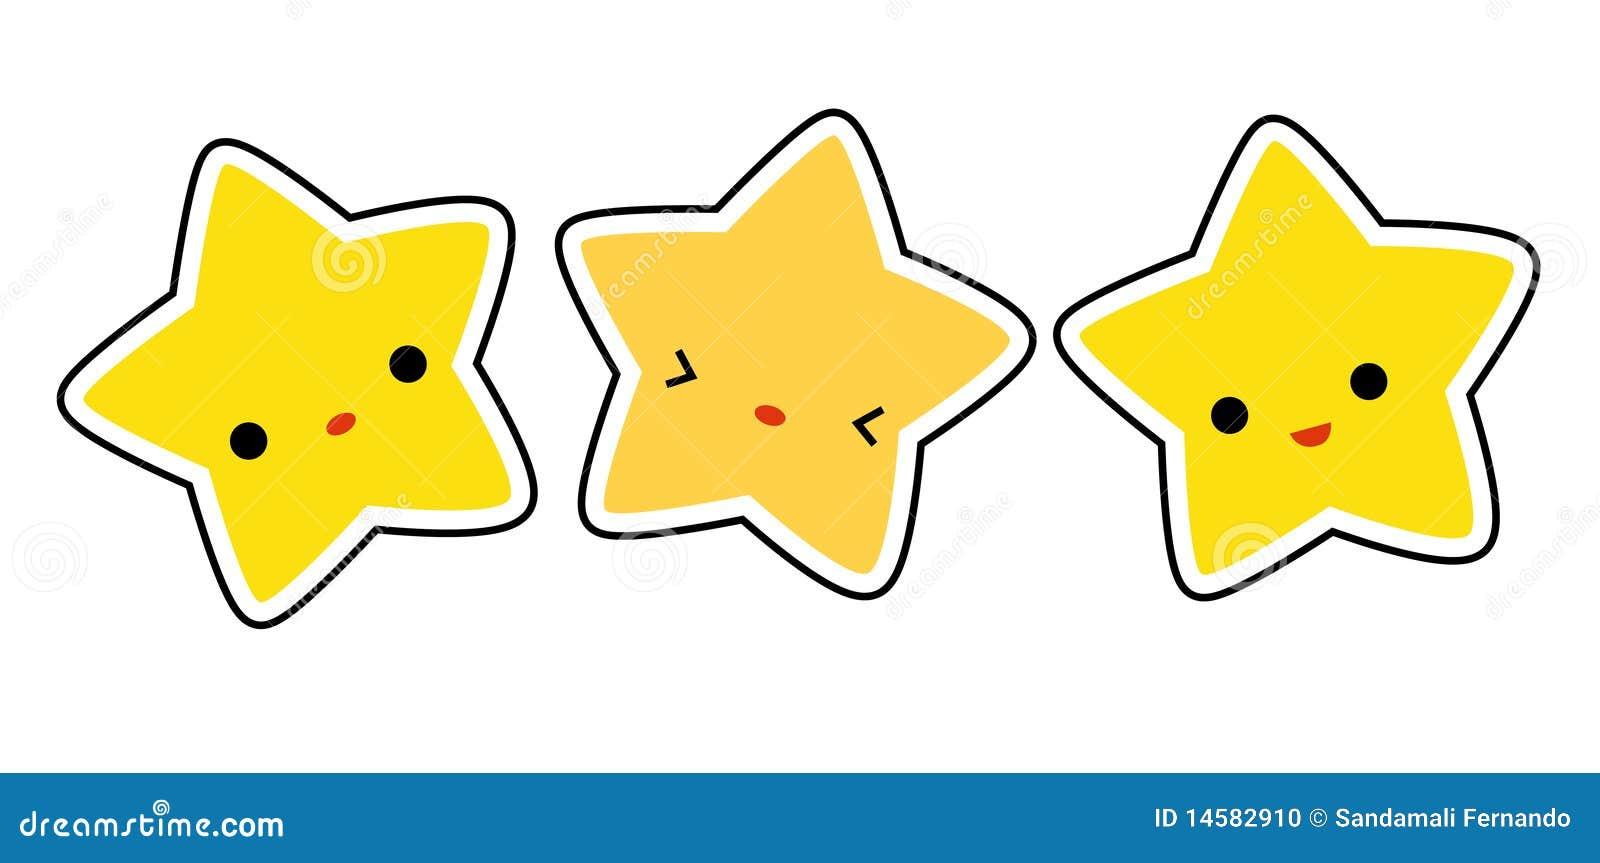 Estrela/estrelas